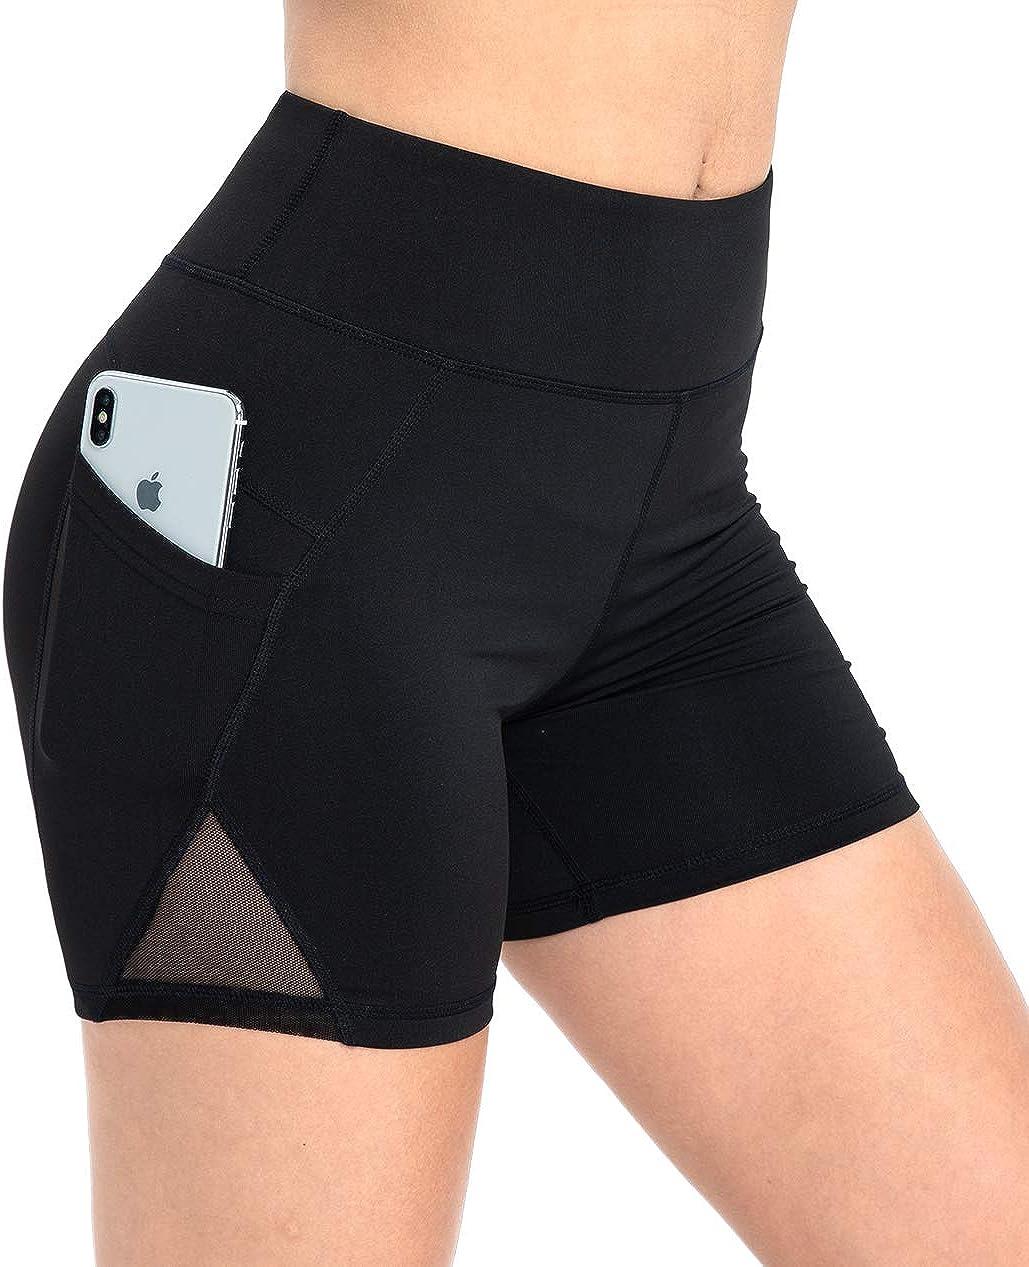 DILANNI Yoga Shorts for Women High Waist Mesh Stretch Running Workout Biker Short Pants